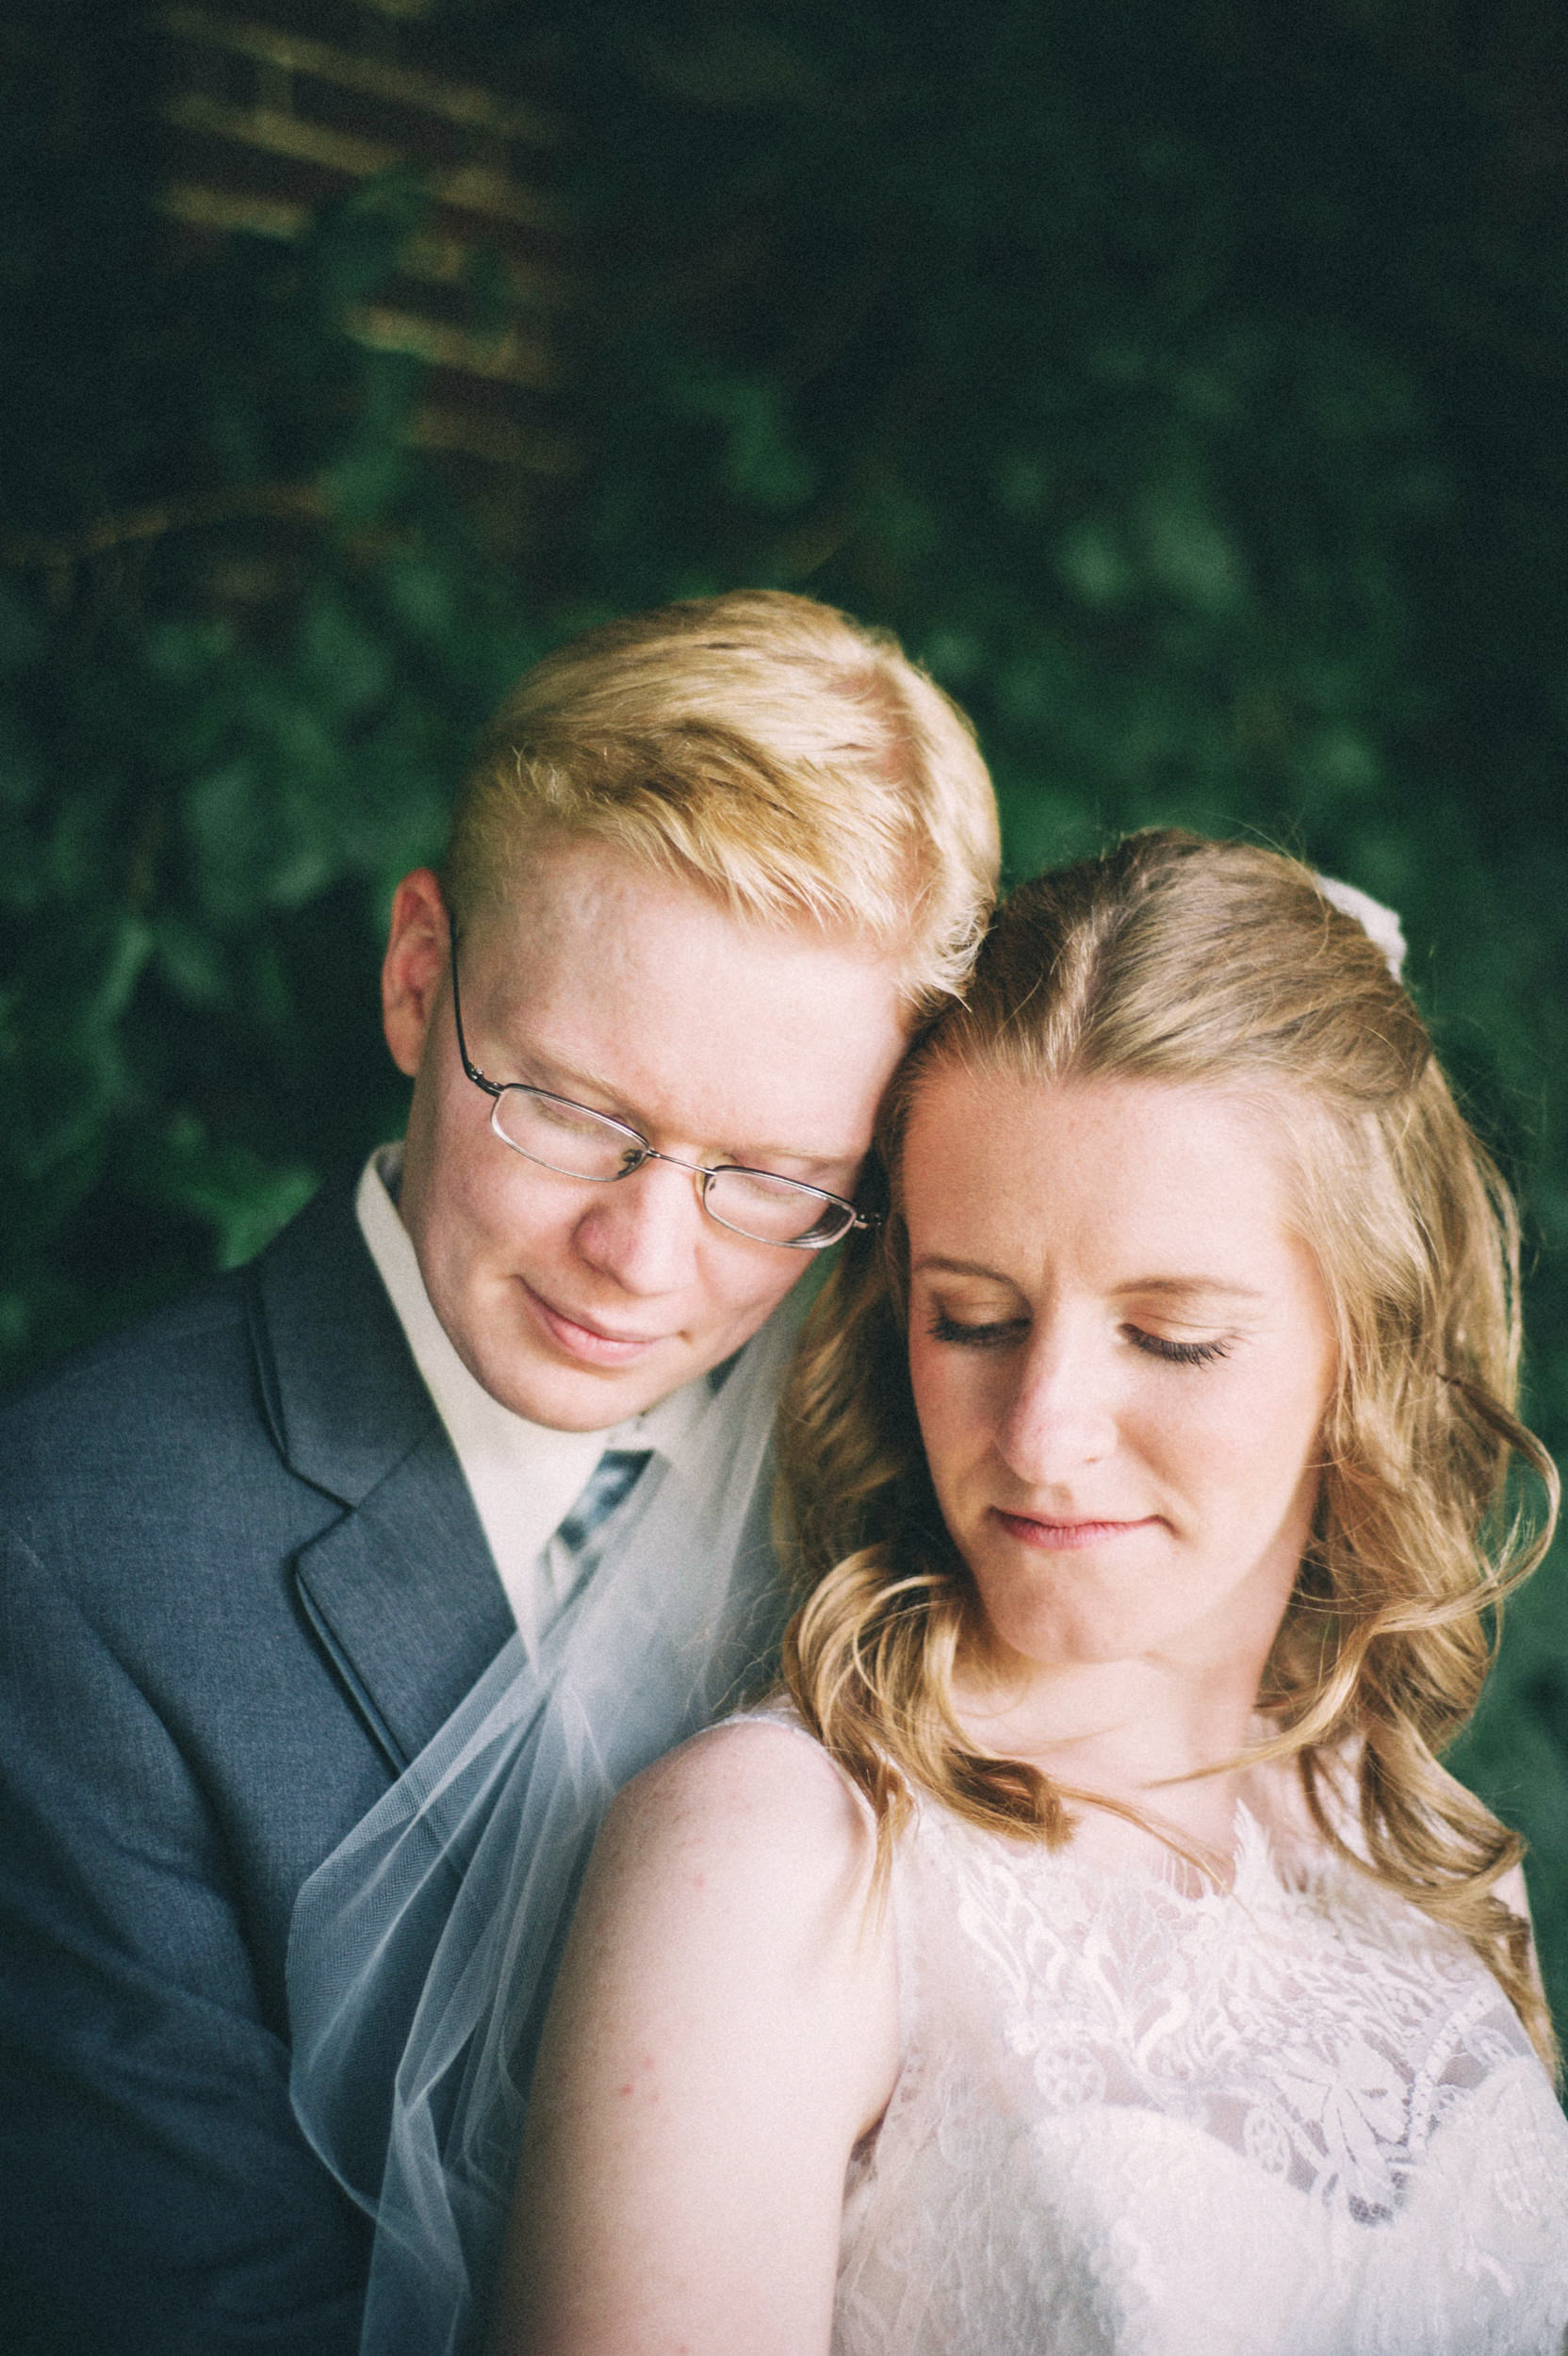 Jenna-Patrick-Garden-Court-Presbyterian-Seminary-Wedding-Louisville-Kentucky-Sarah-Katherine-Davis-Photography-53.jpg